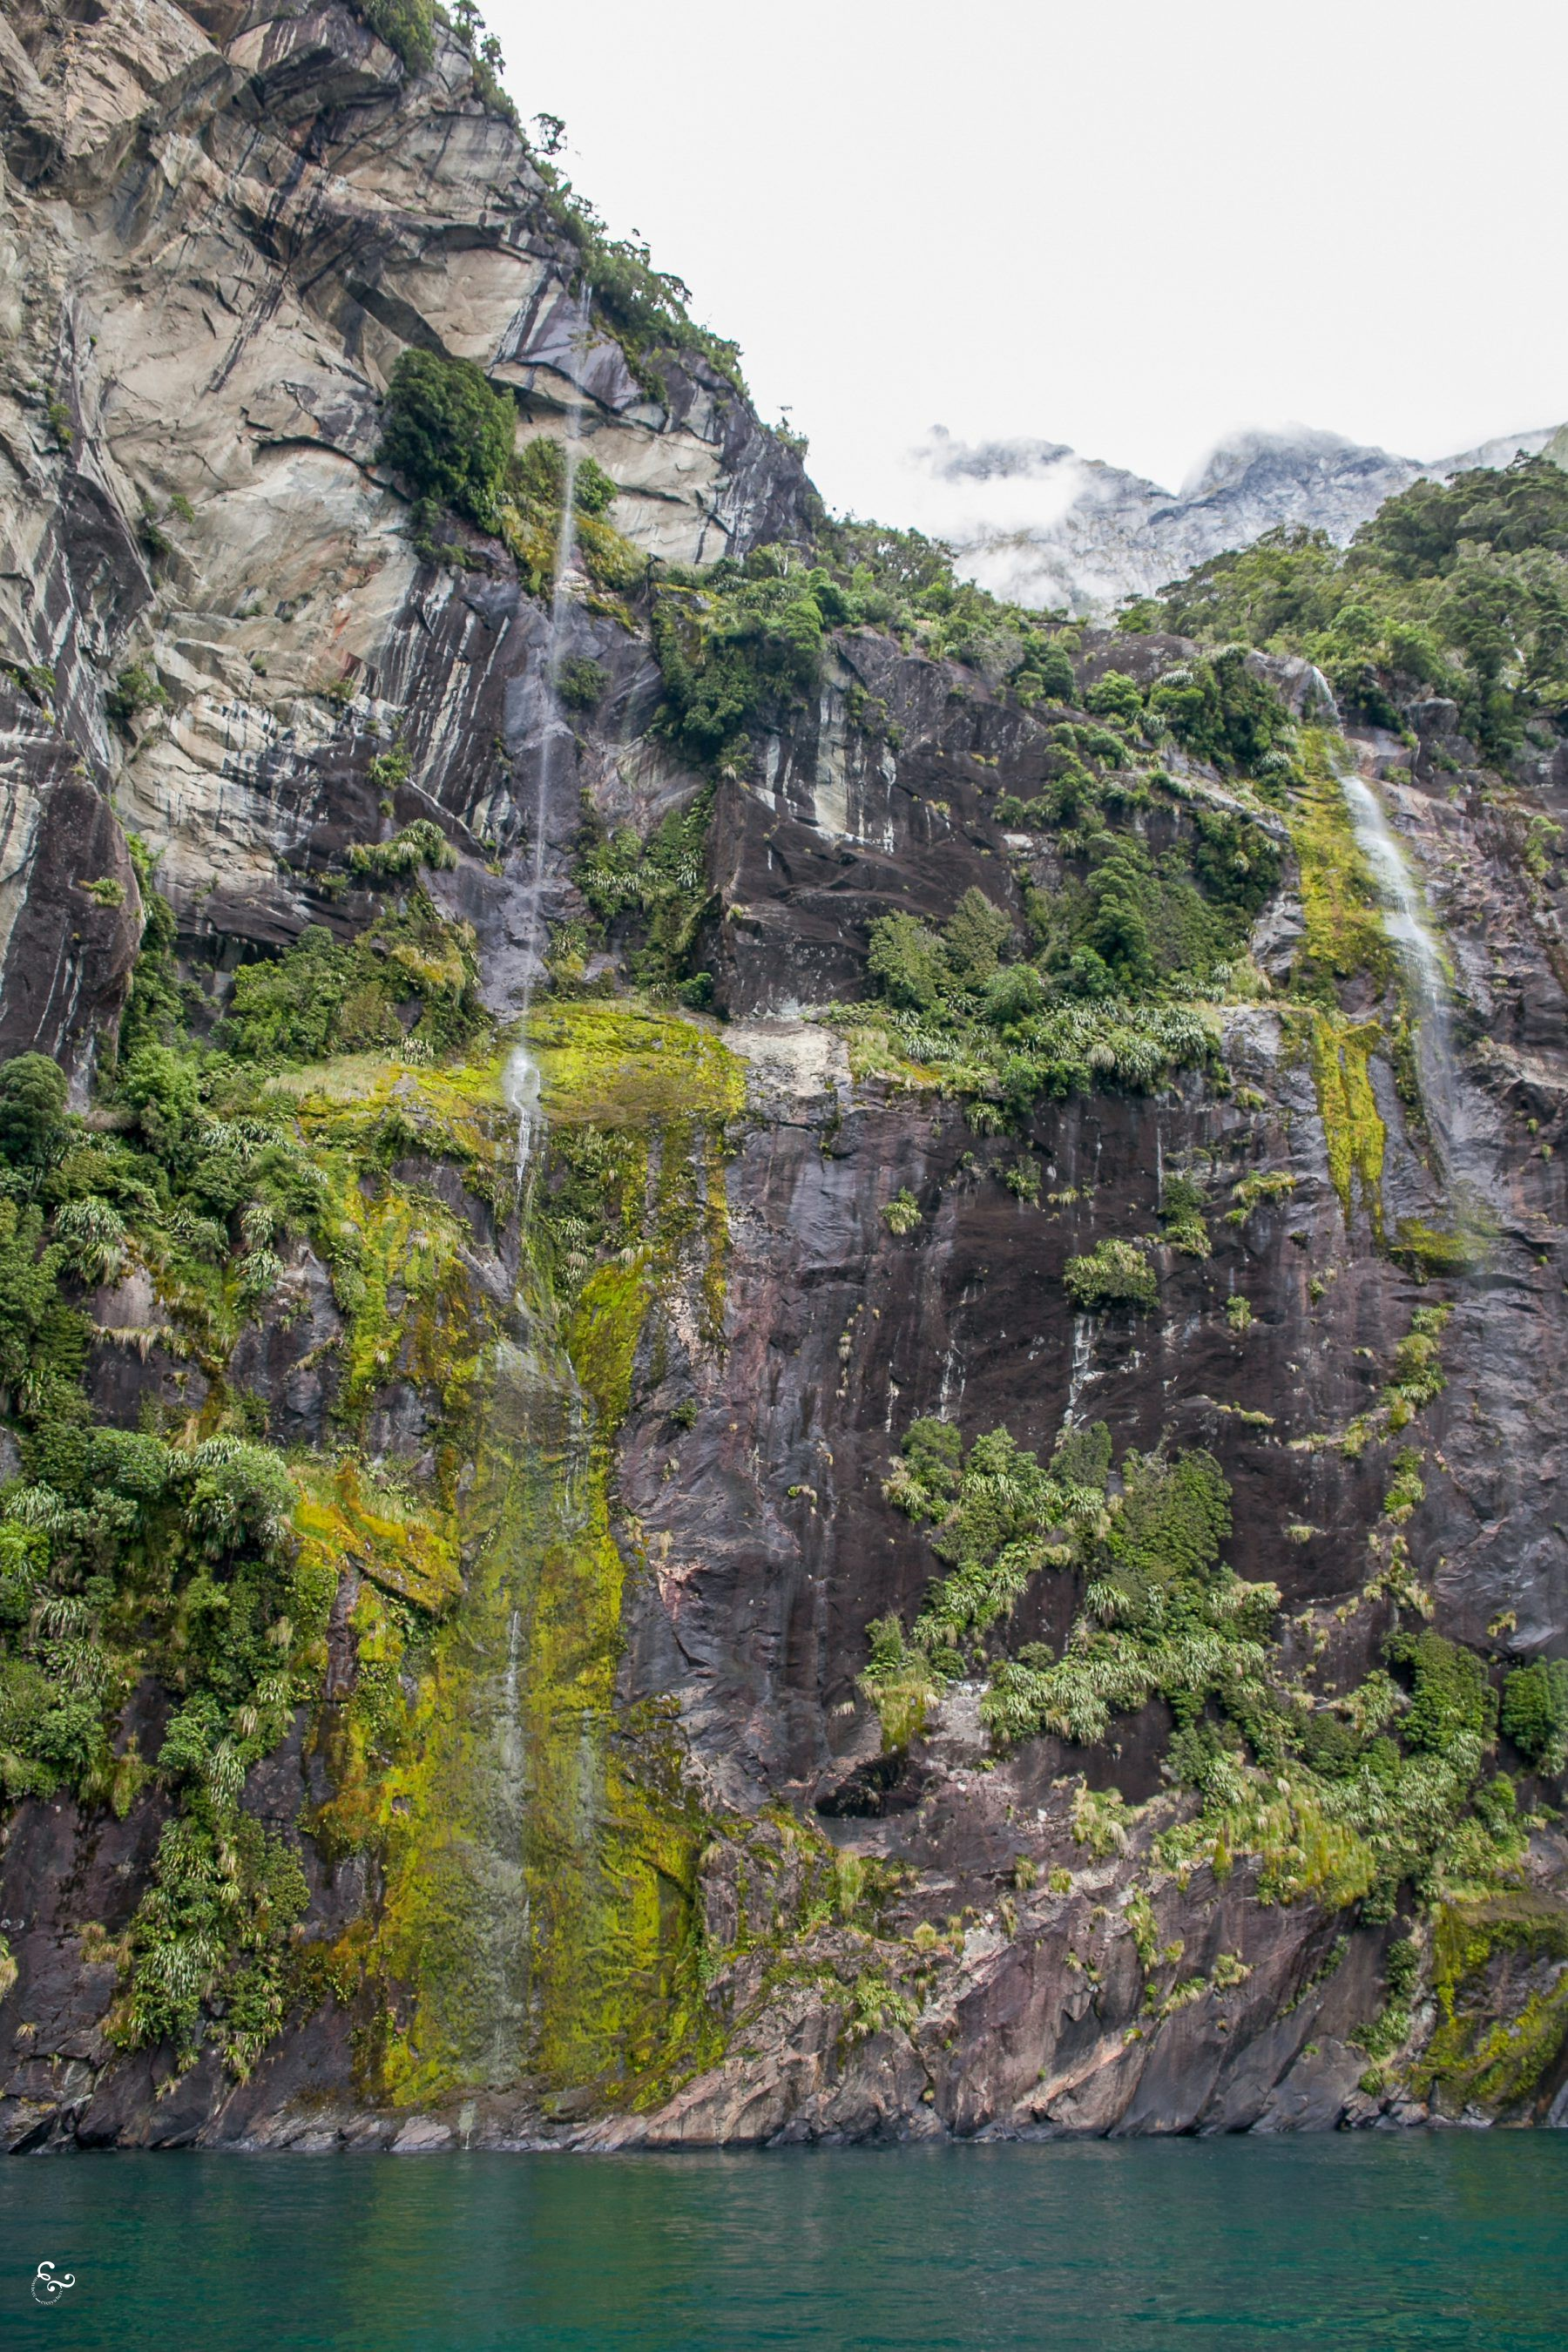 Milford Sound Waterfalls New Zealand Photography Lis Dingjan Nowhere & Everywhere Travel Sustainability Free Range Pixels Blog